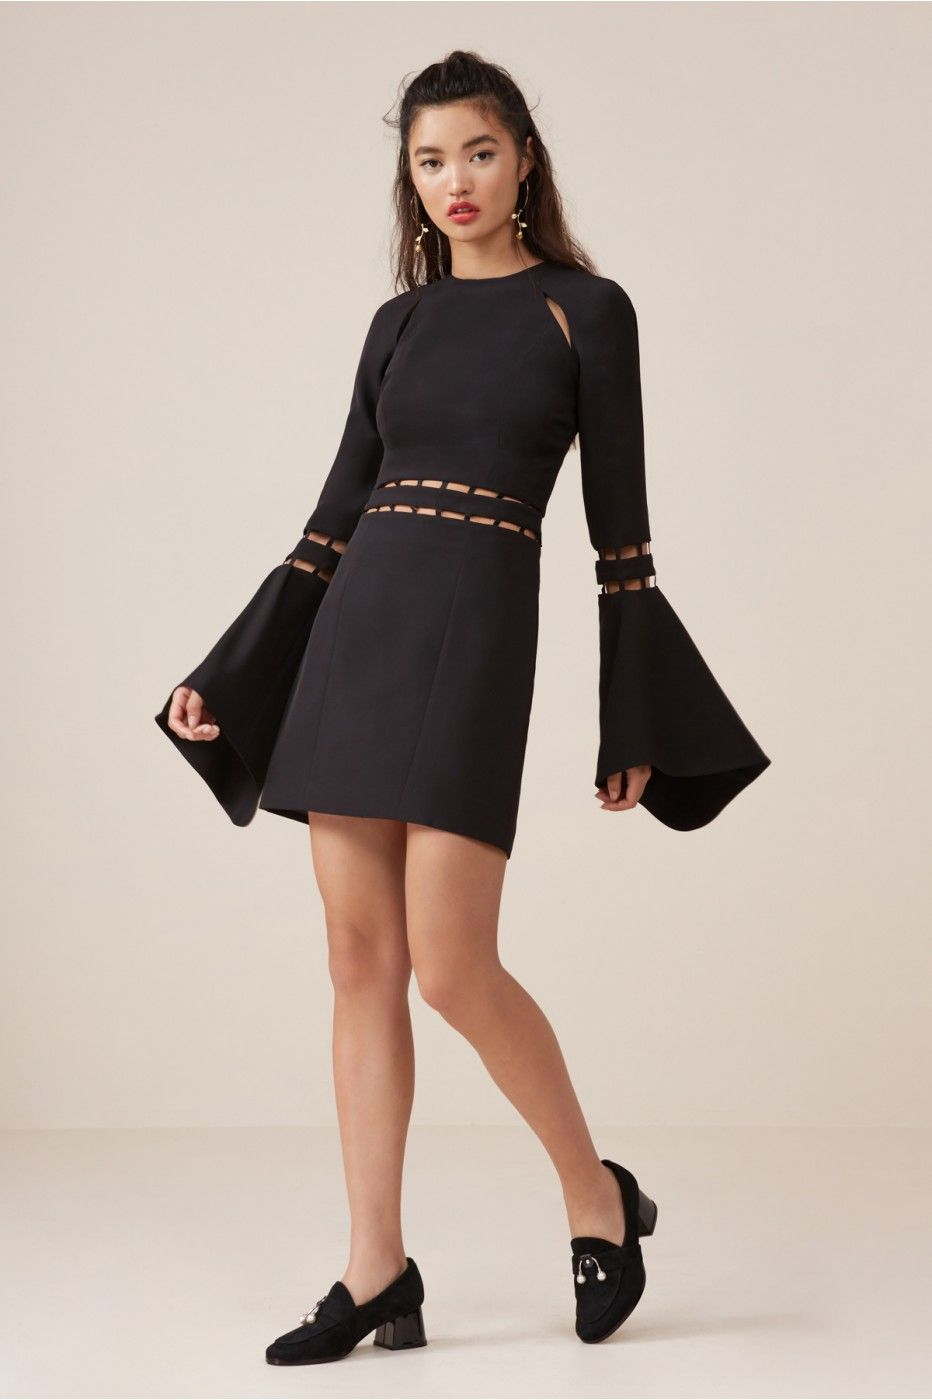 Solar mini dress in My style short dresses Pinterest